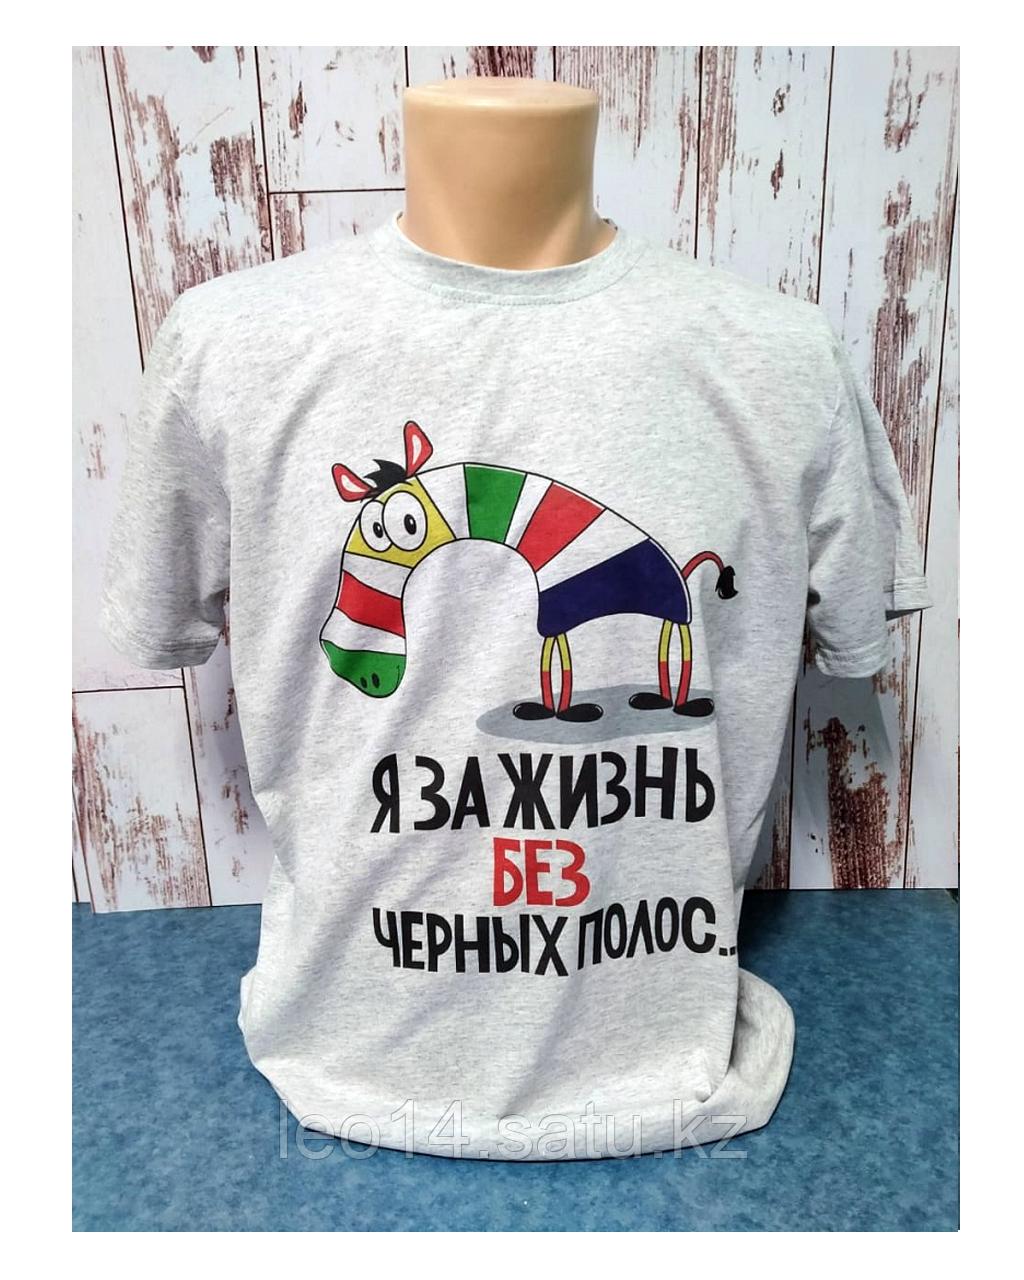 "Футболка ""Я за жизнь без черных полос"", 48(M), 100%ХБ"